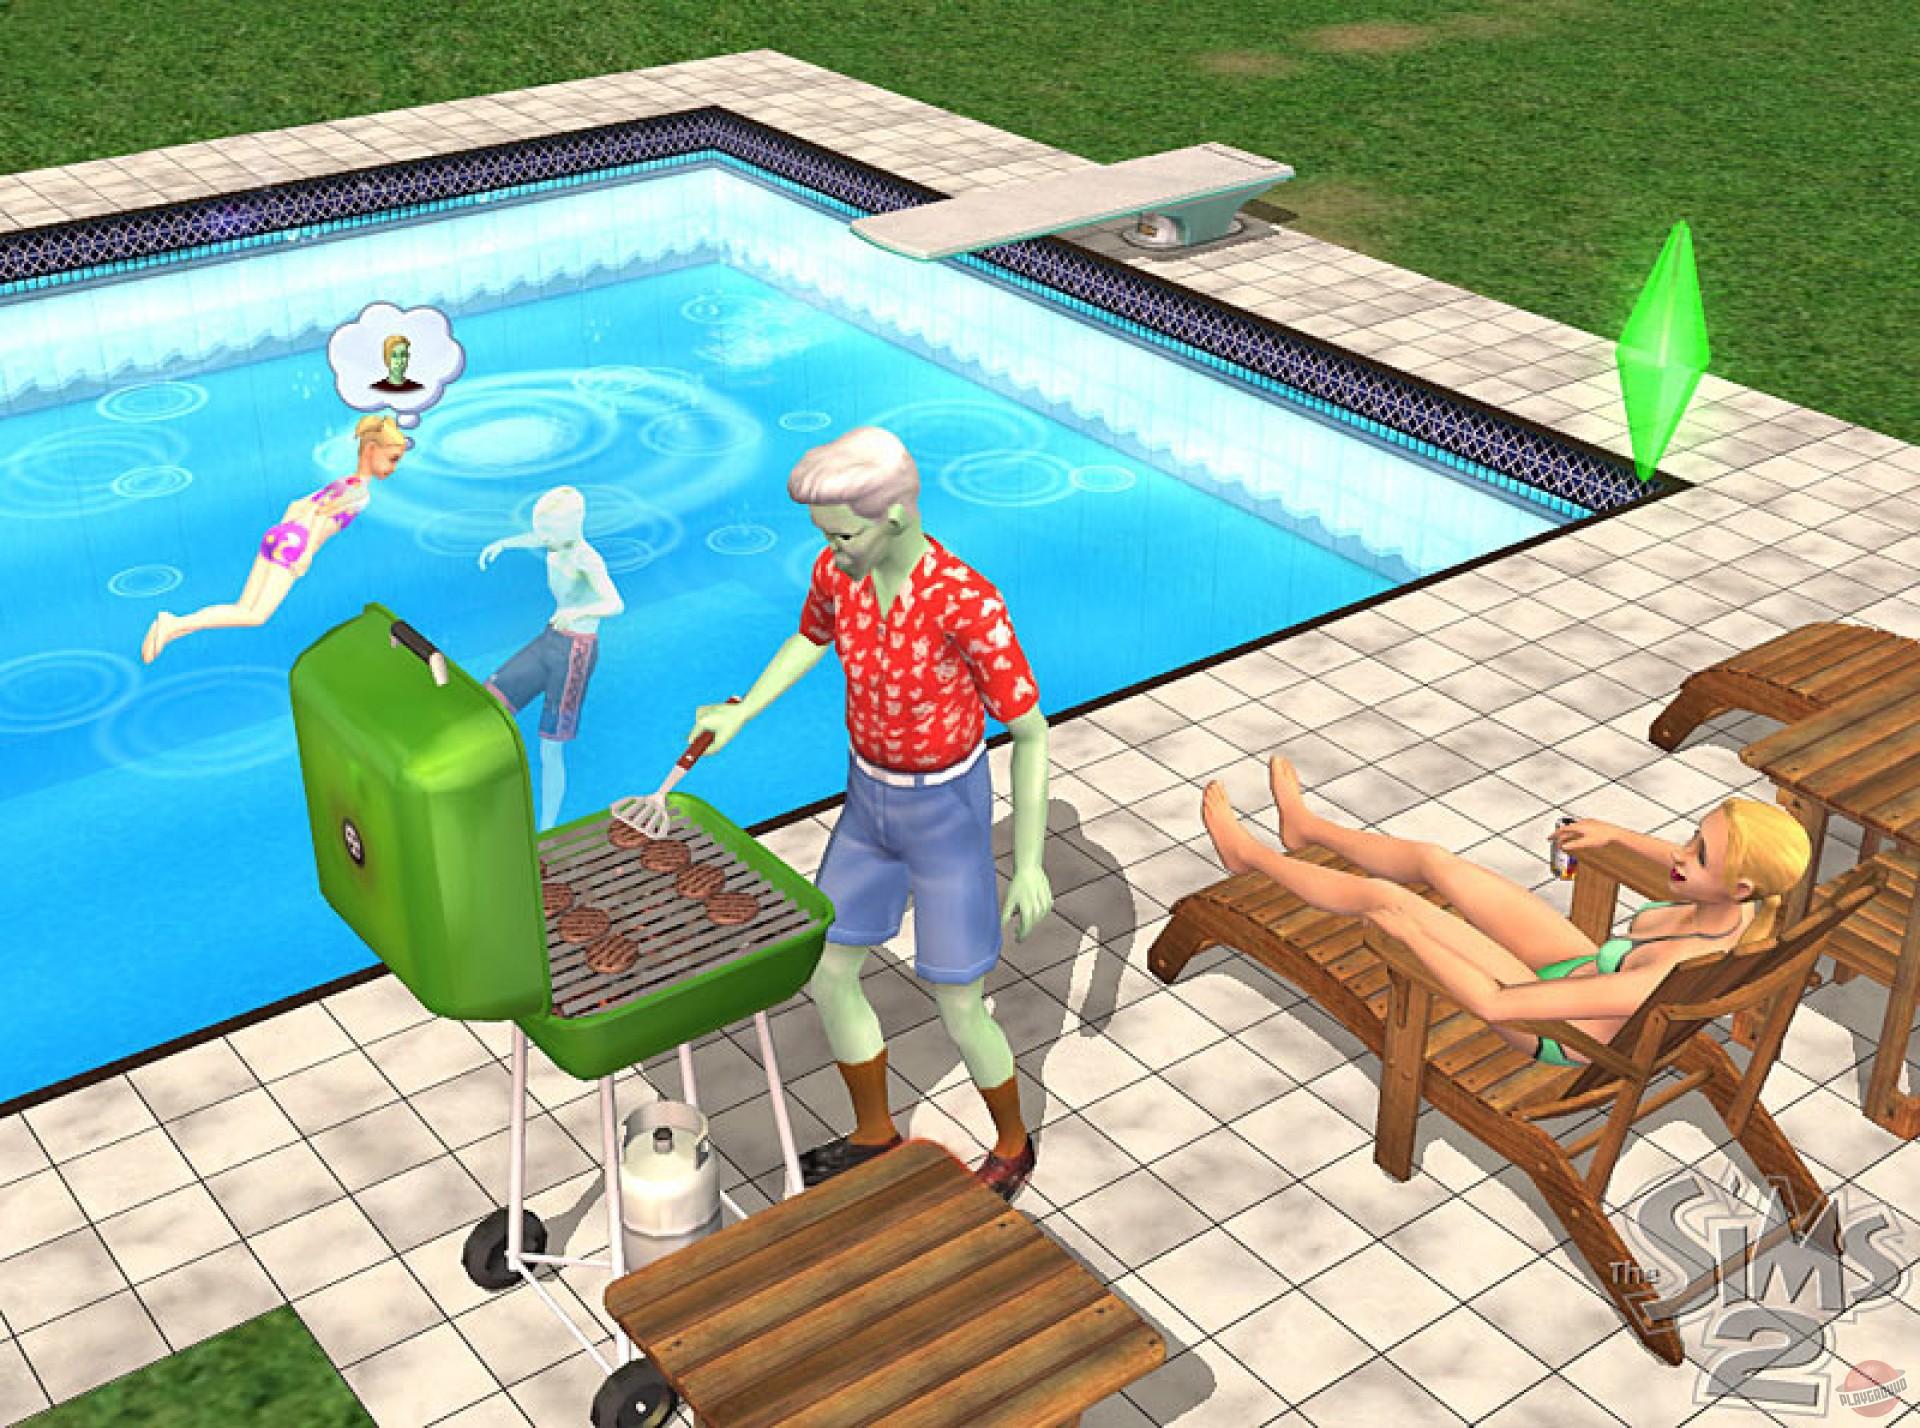 Sims 2 crfxfnm 1 фотография